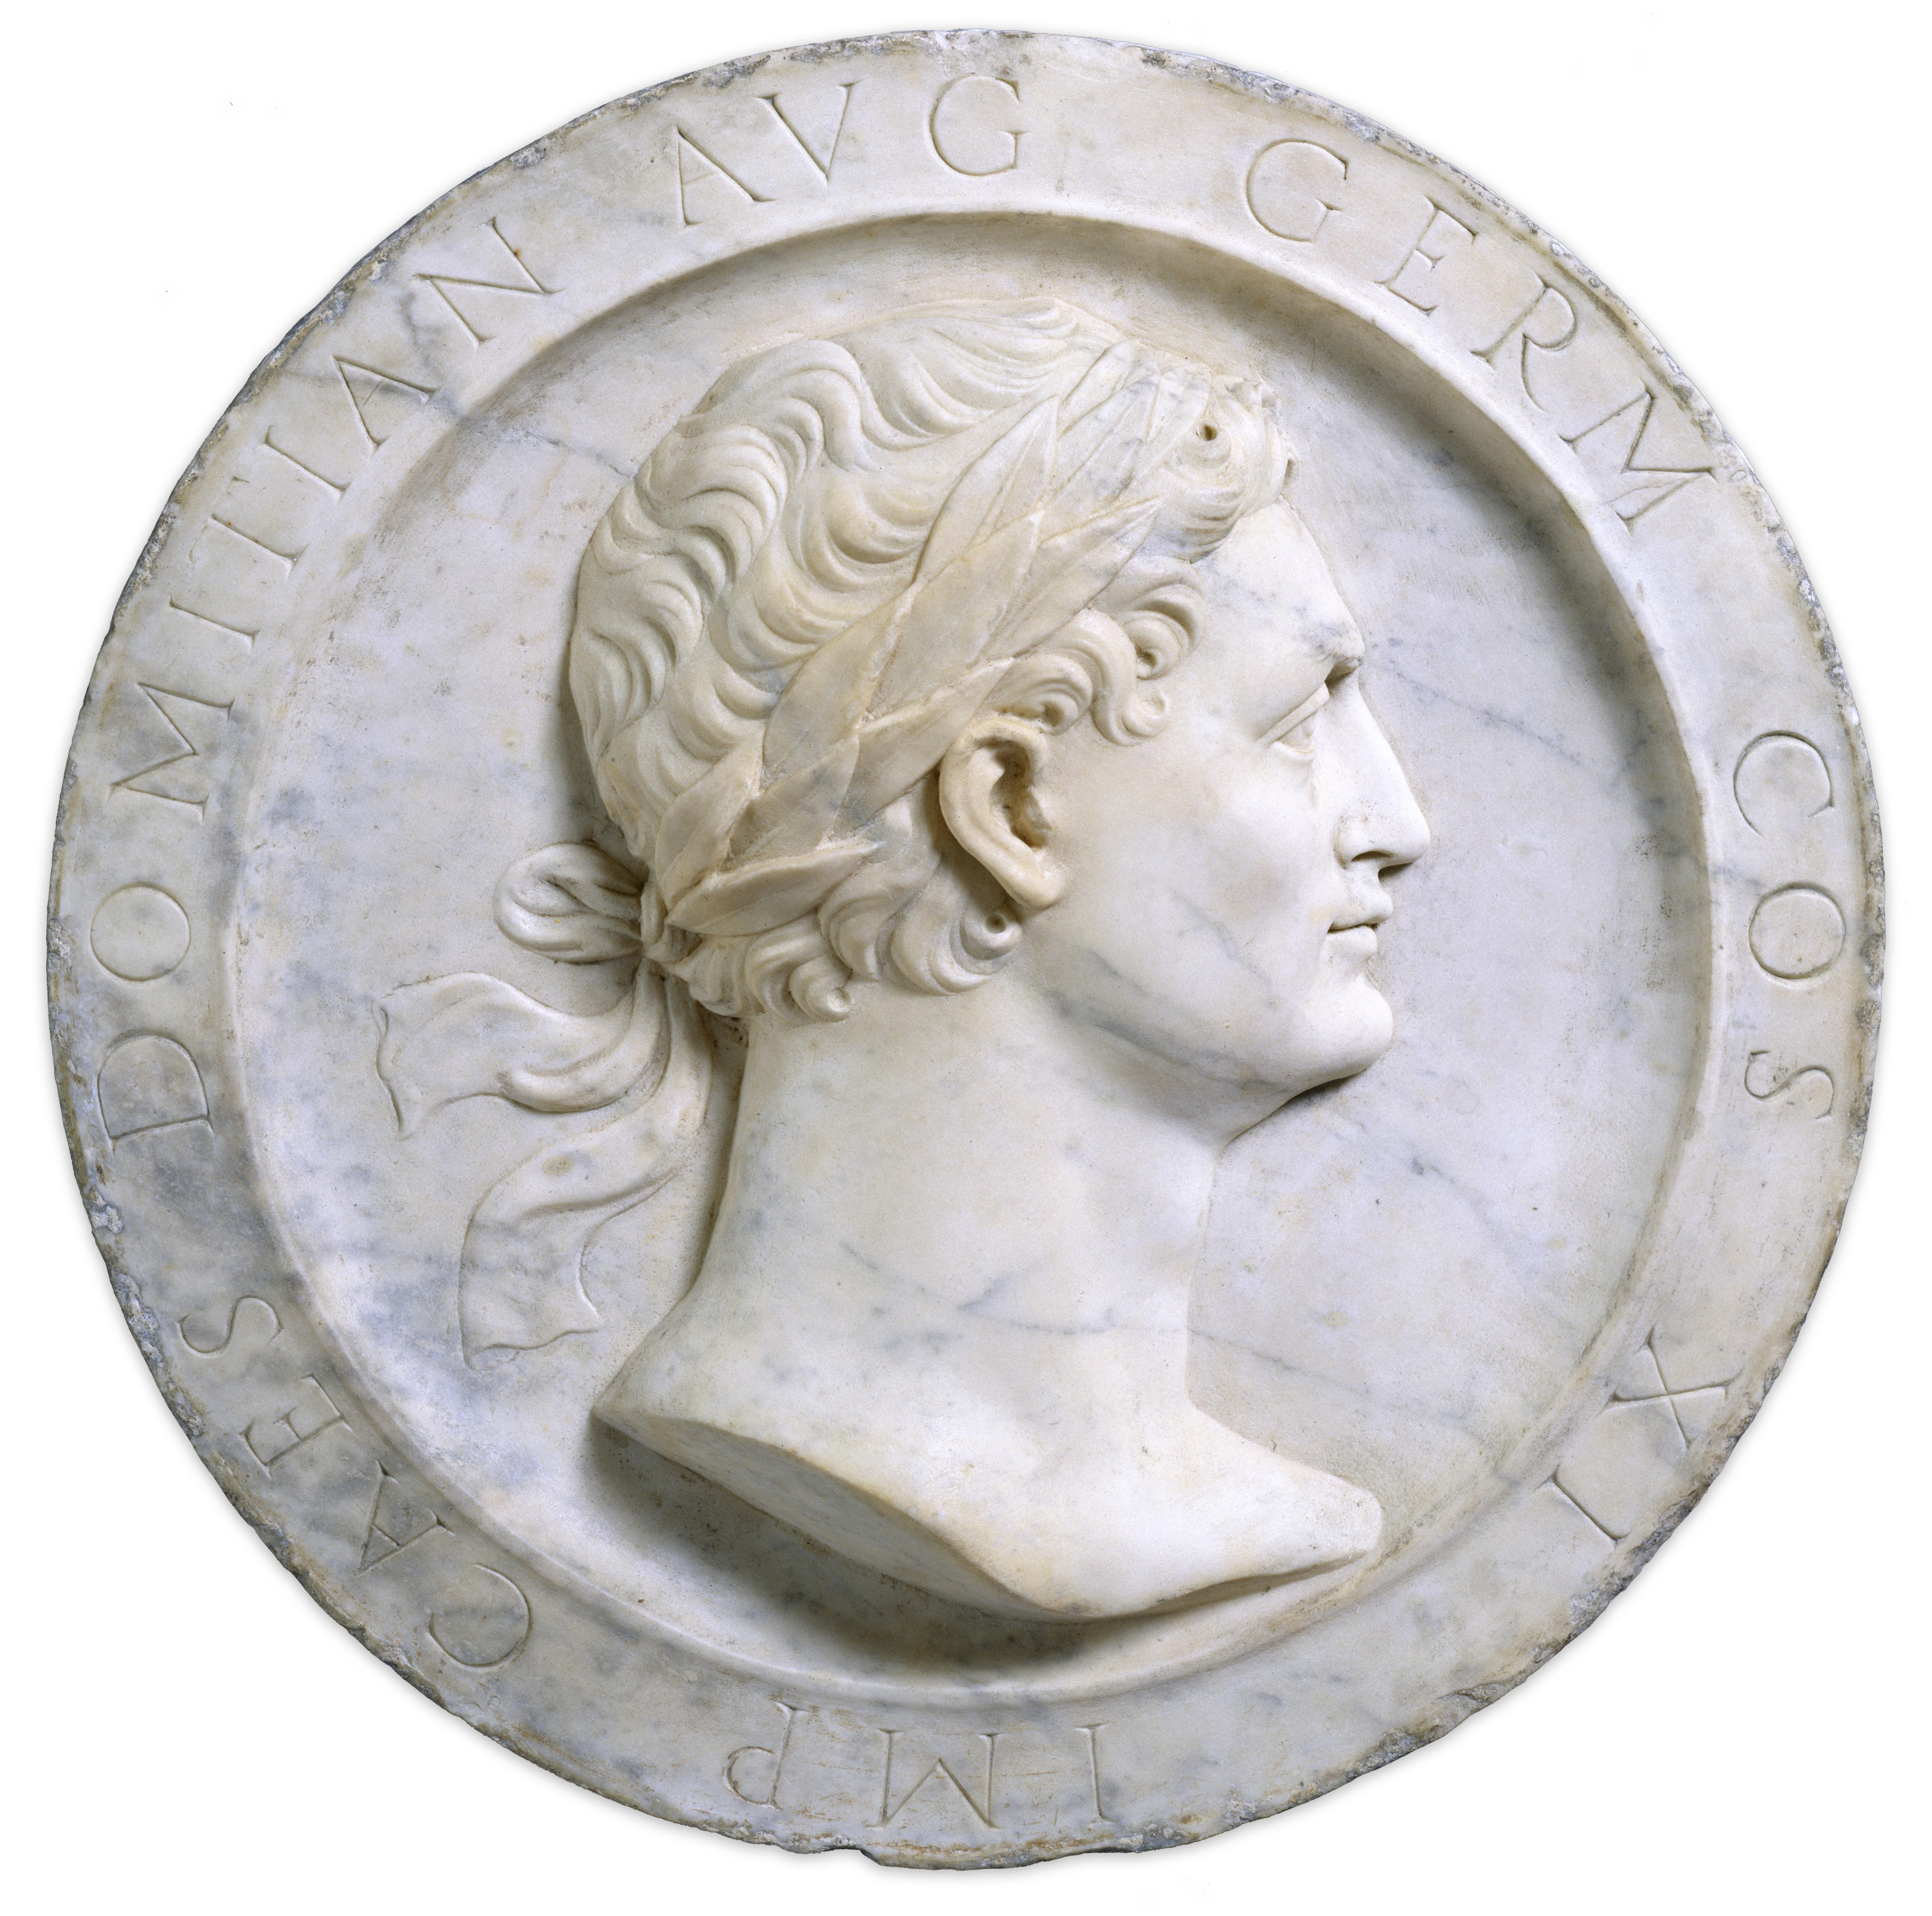 Domicià, Alfonso Lombardi, 1530-1533